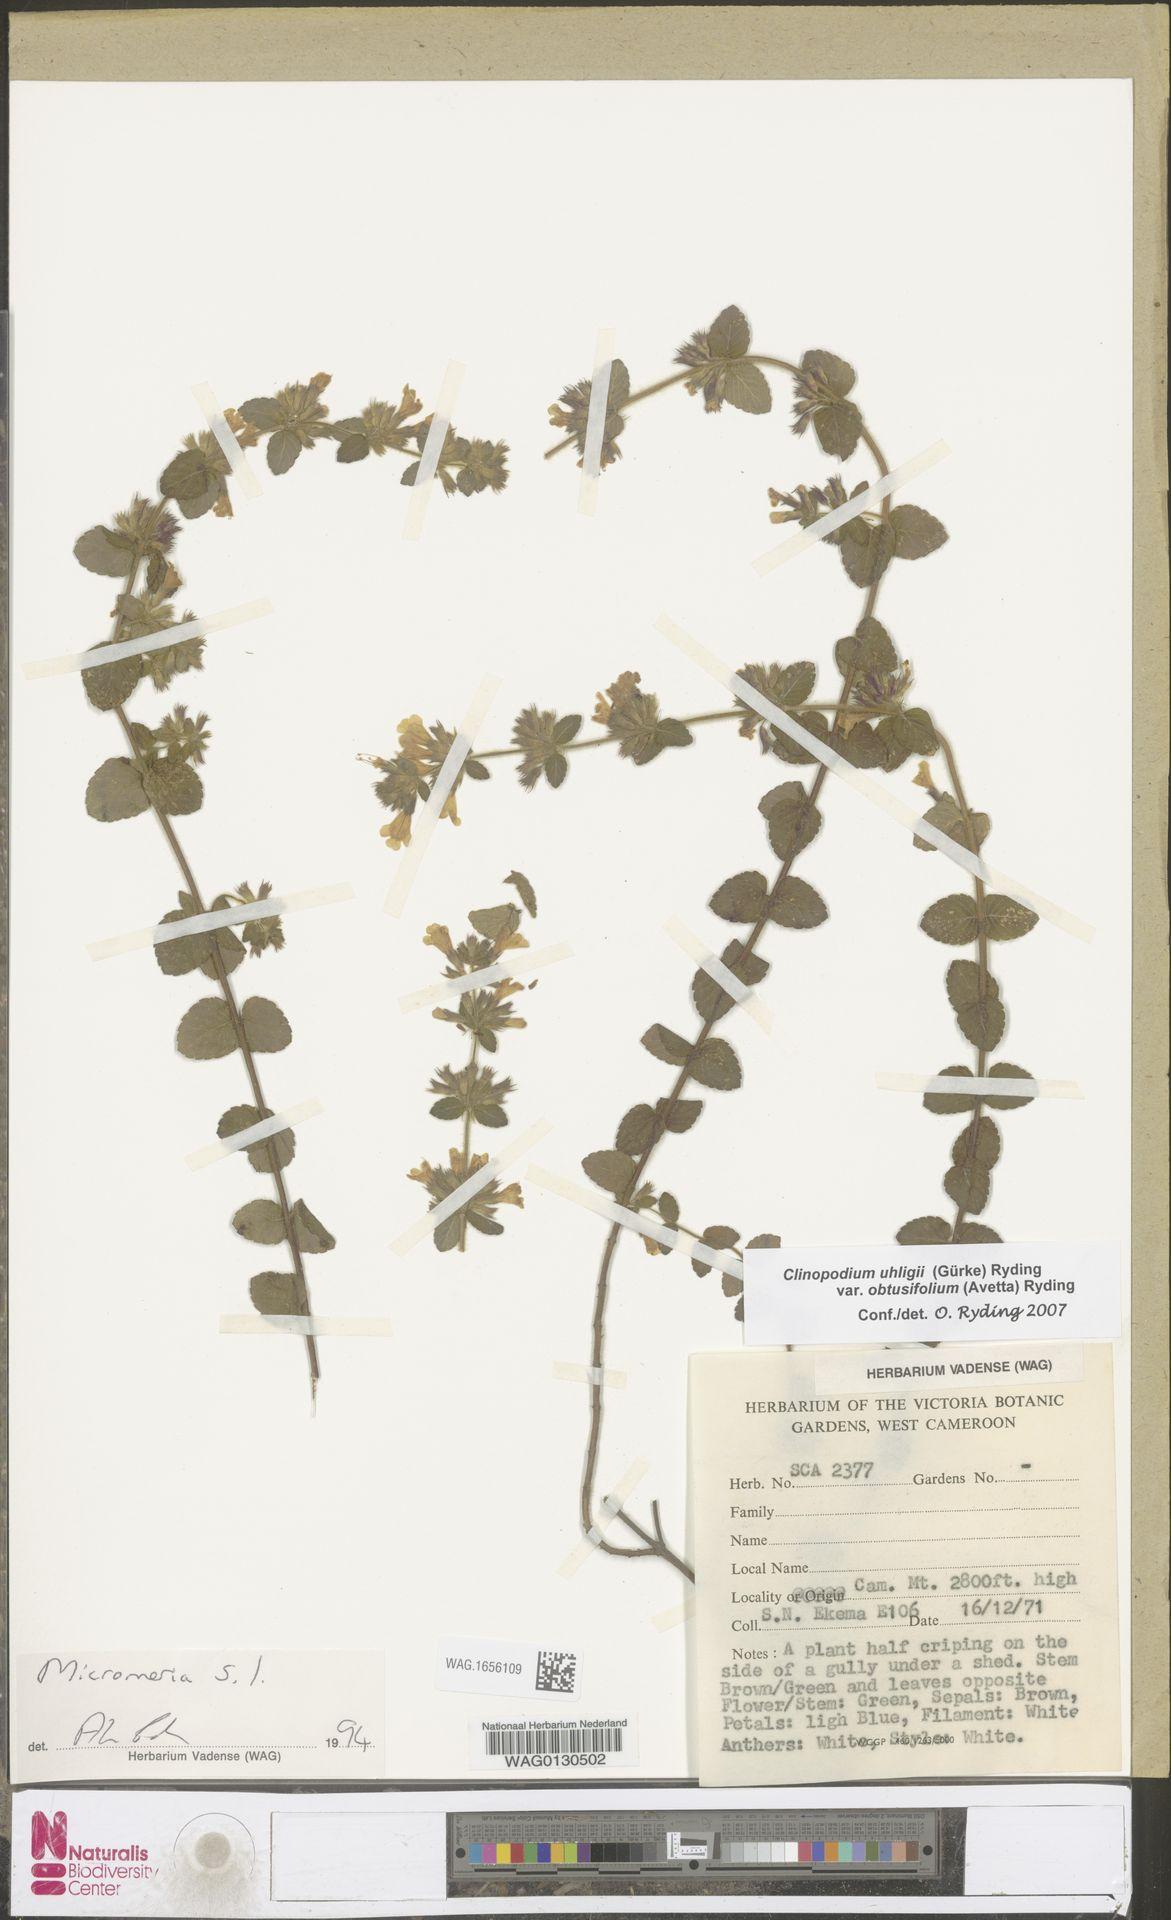 WAG.1656109 | Clinopodium uhligii var. obtusifolium (Avetta) Ryding